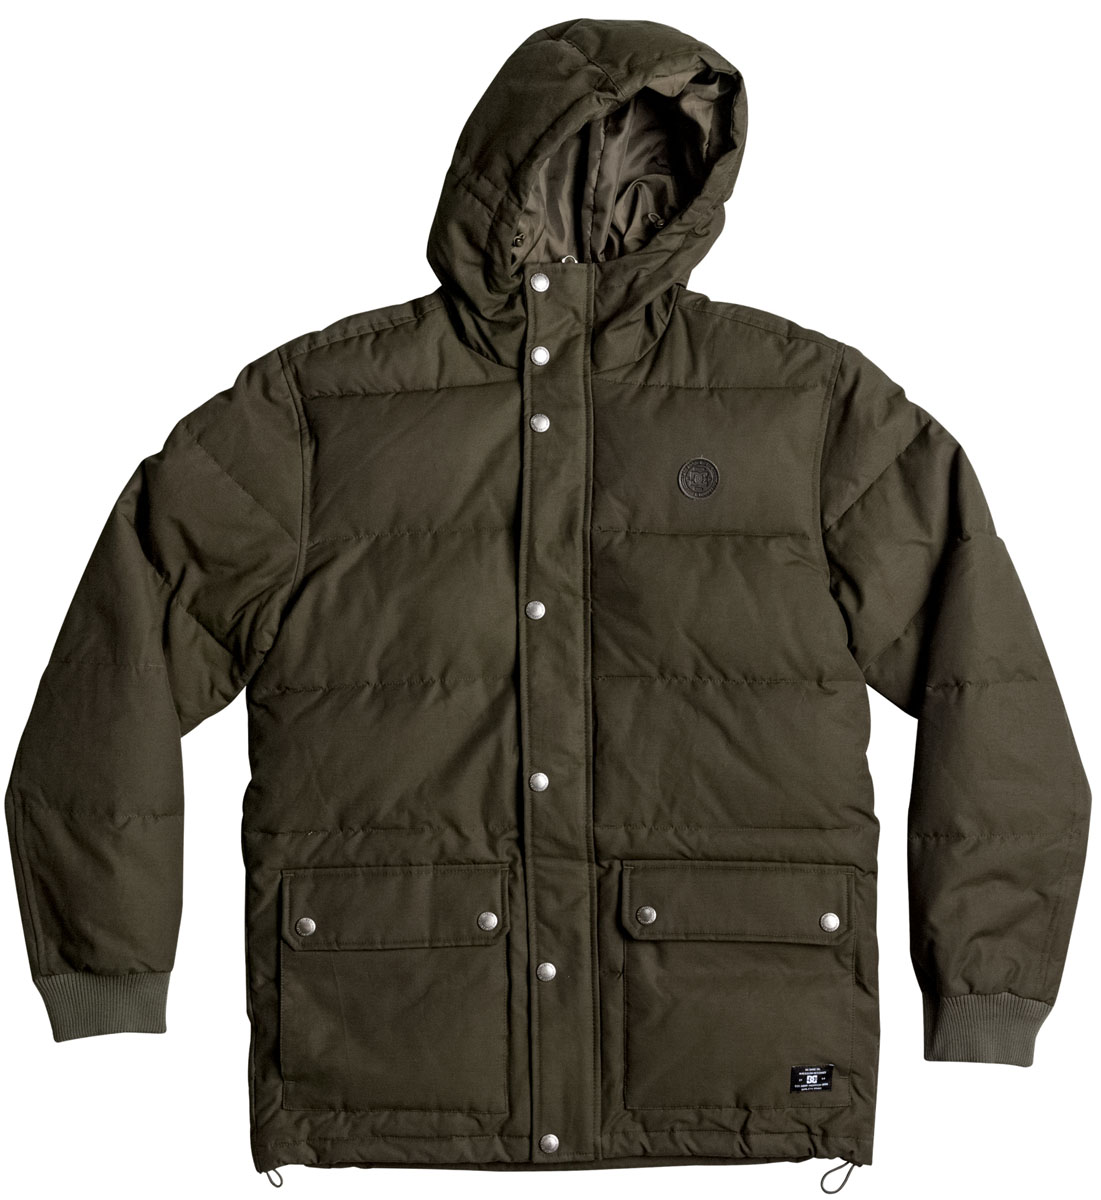 Куртка мужская DC Shoes, цвет: темно-зеленый. EDYJK03124-CSN0. Размер L (50)EDYJK03124-CSN0